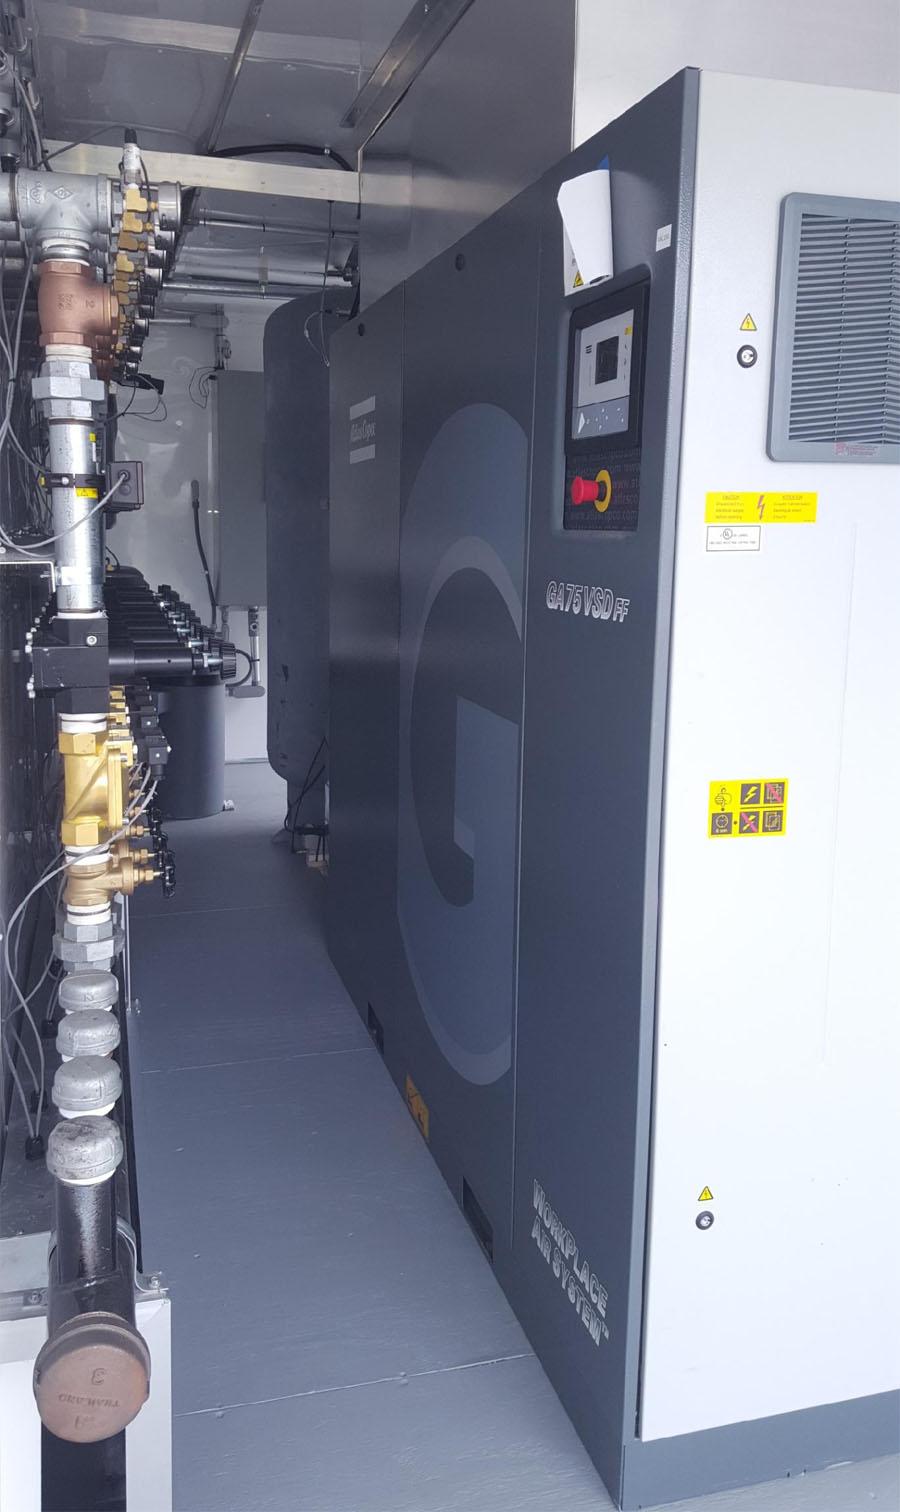 Rotary Screw Compressors Mid Atlantic Environmental